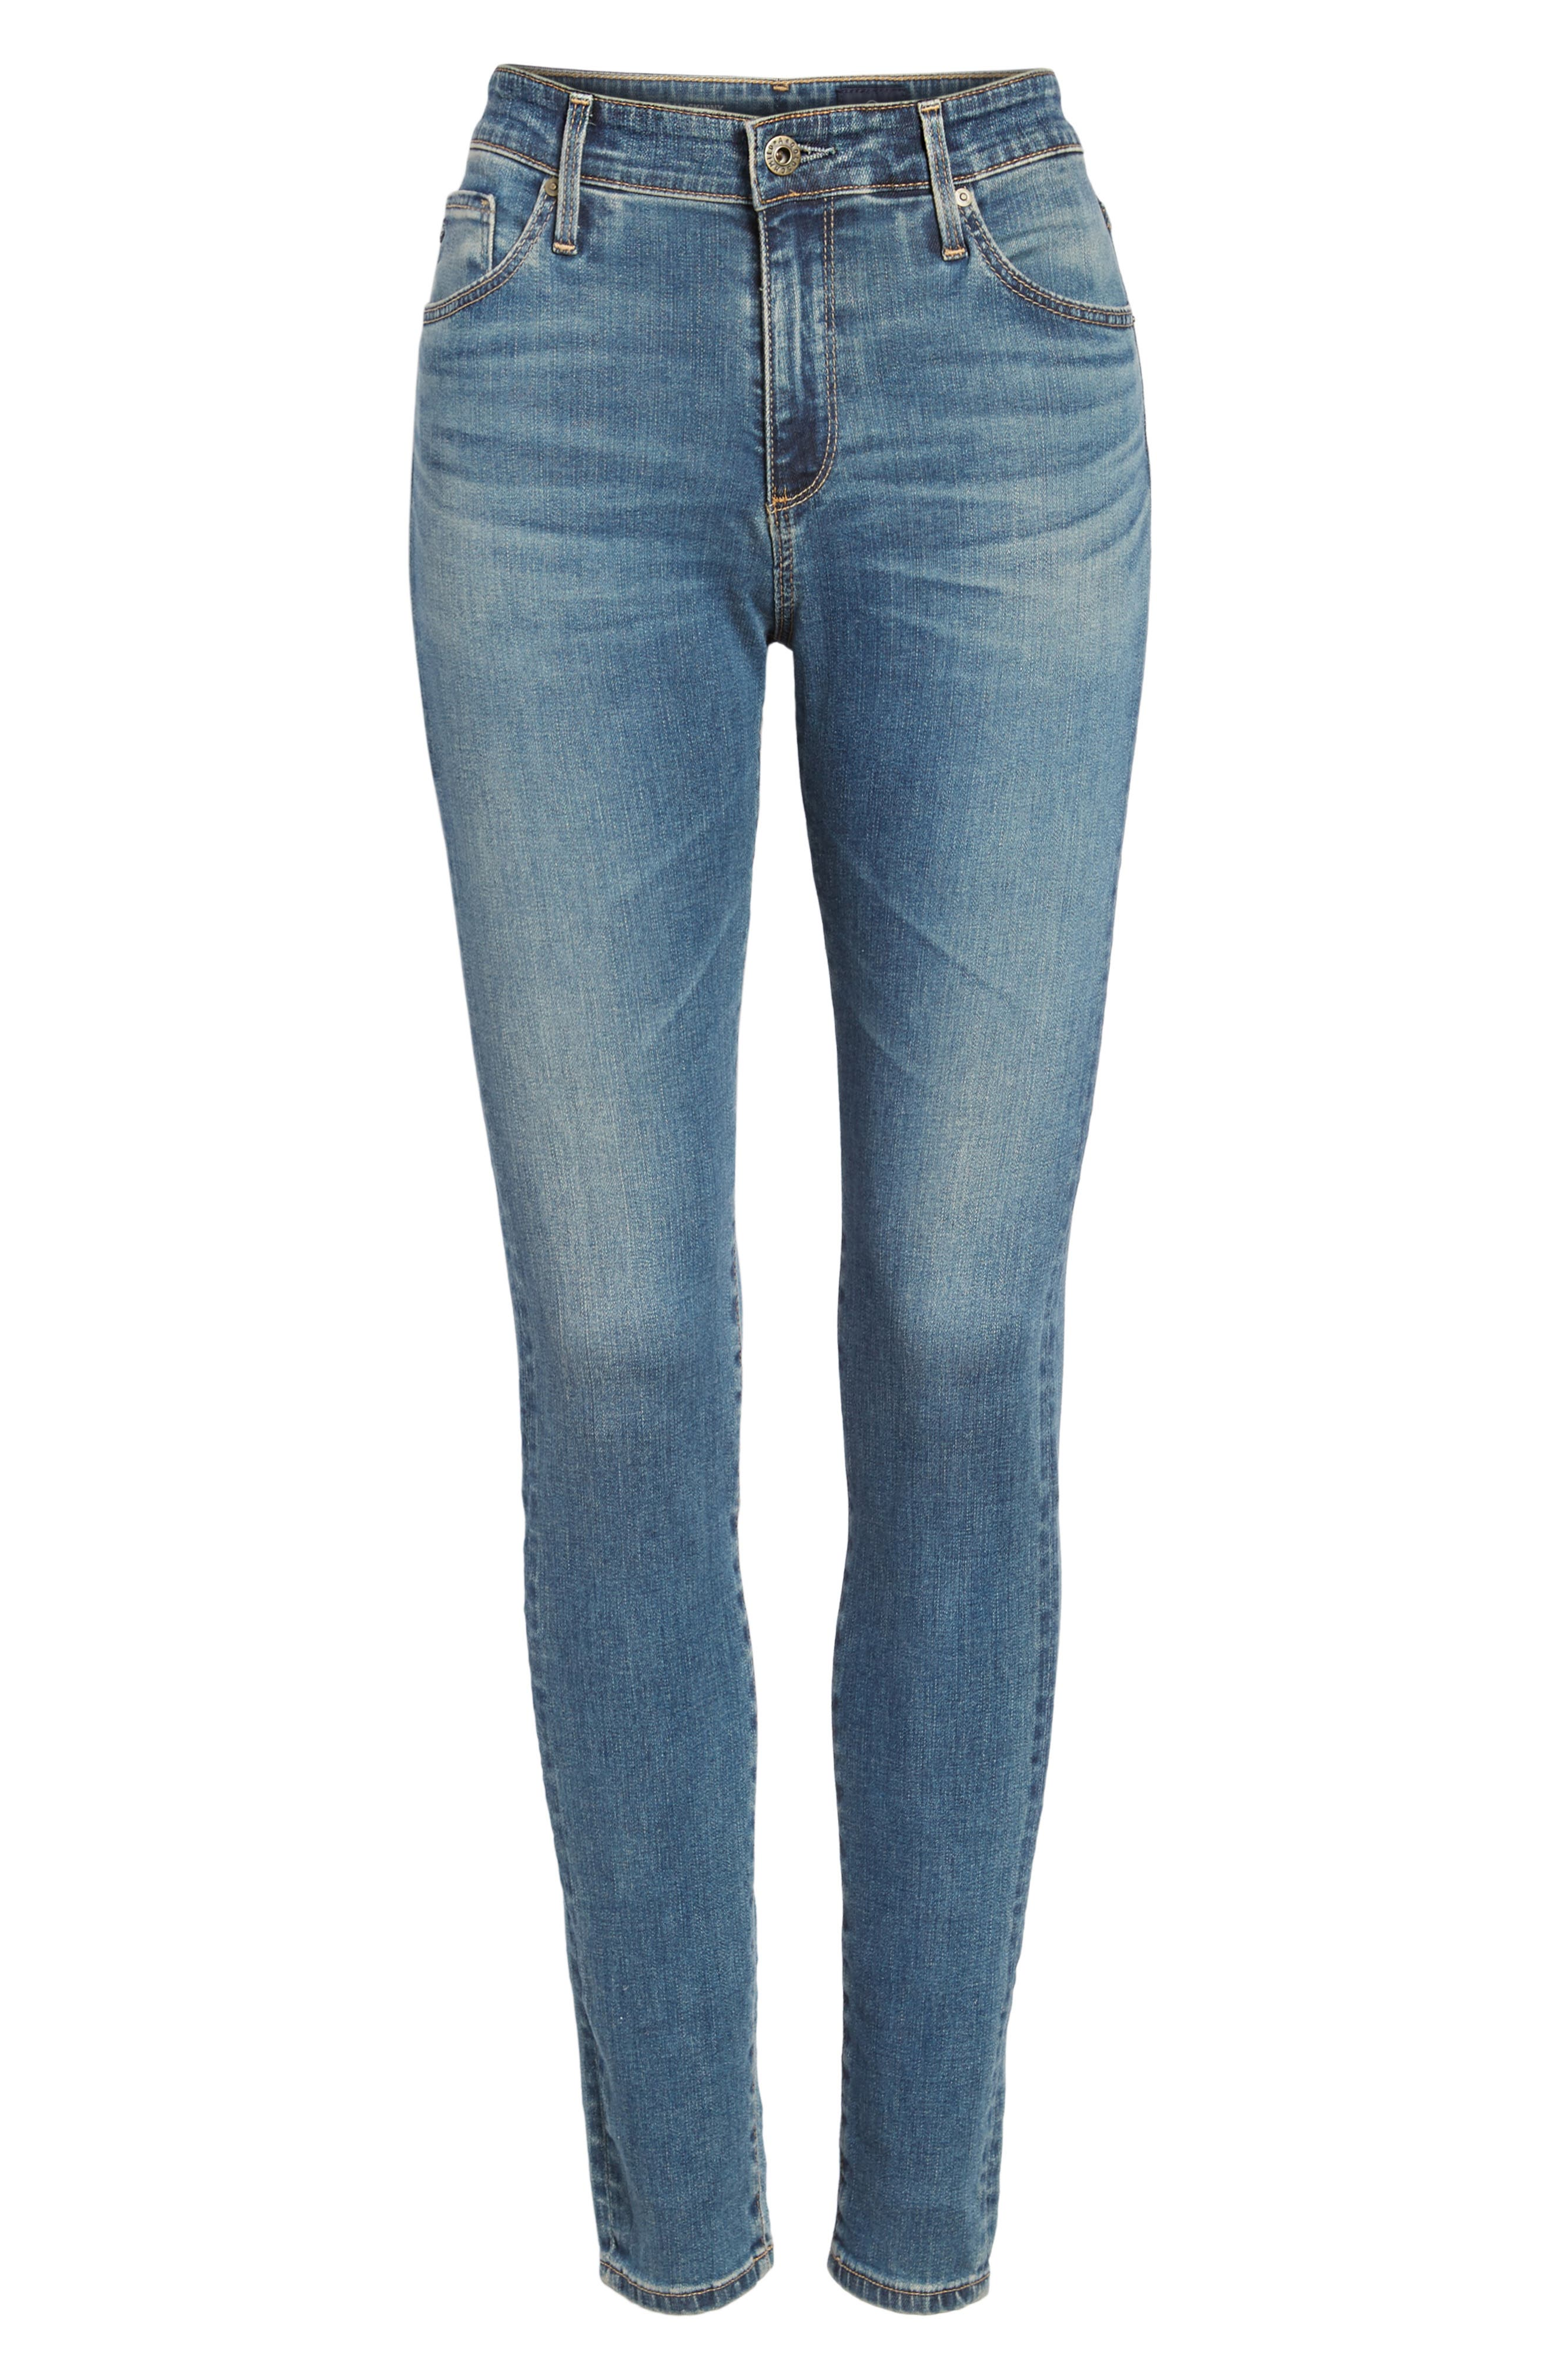 'The Farrah' High Rise Skinny Jeans,                             Alternate thumbnail 51, color,